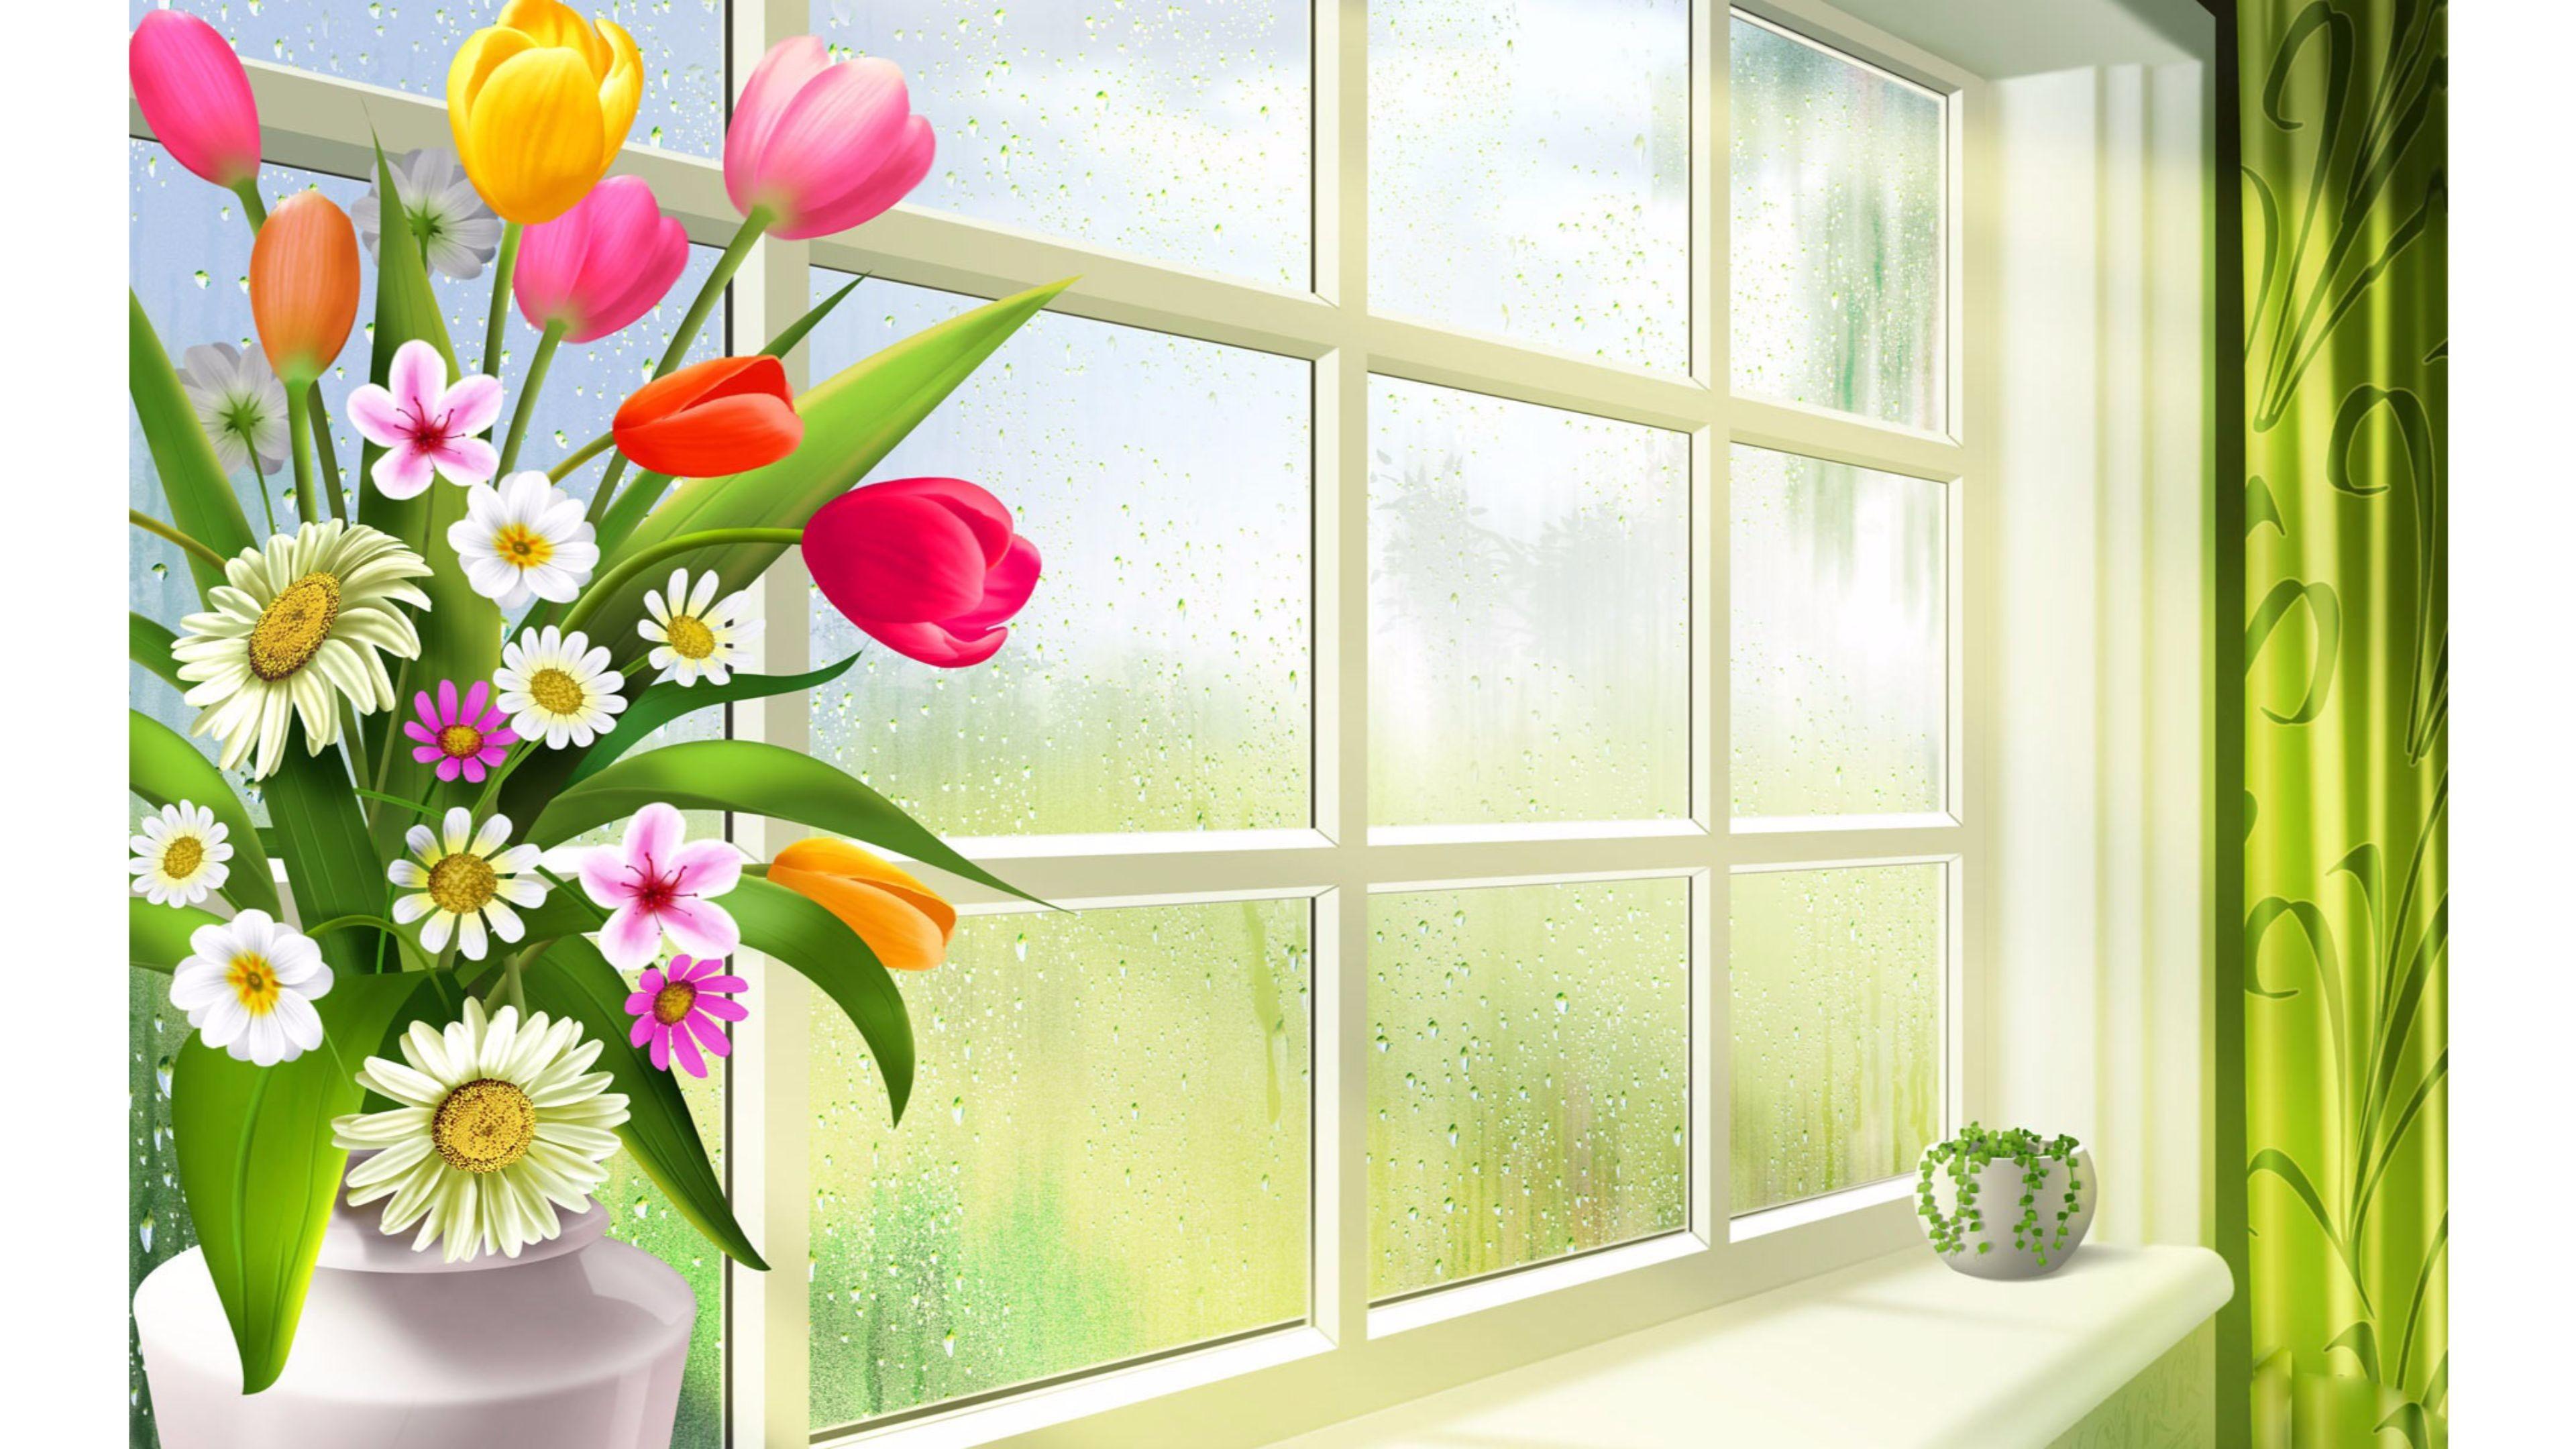 Cartoon Spring 4K Wallpapers